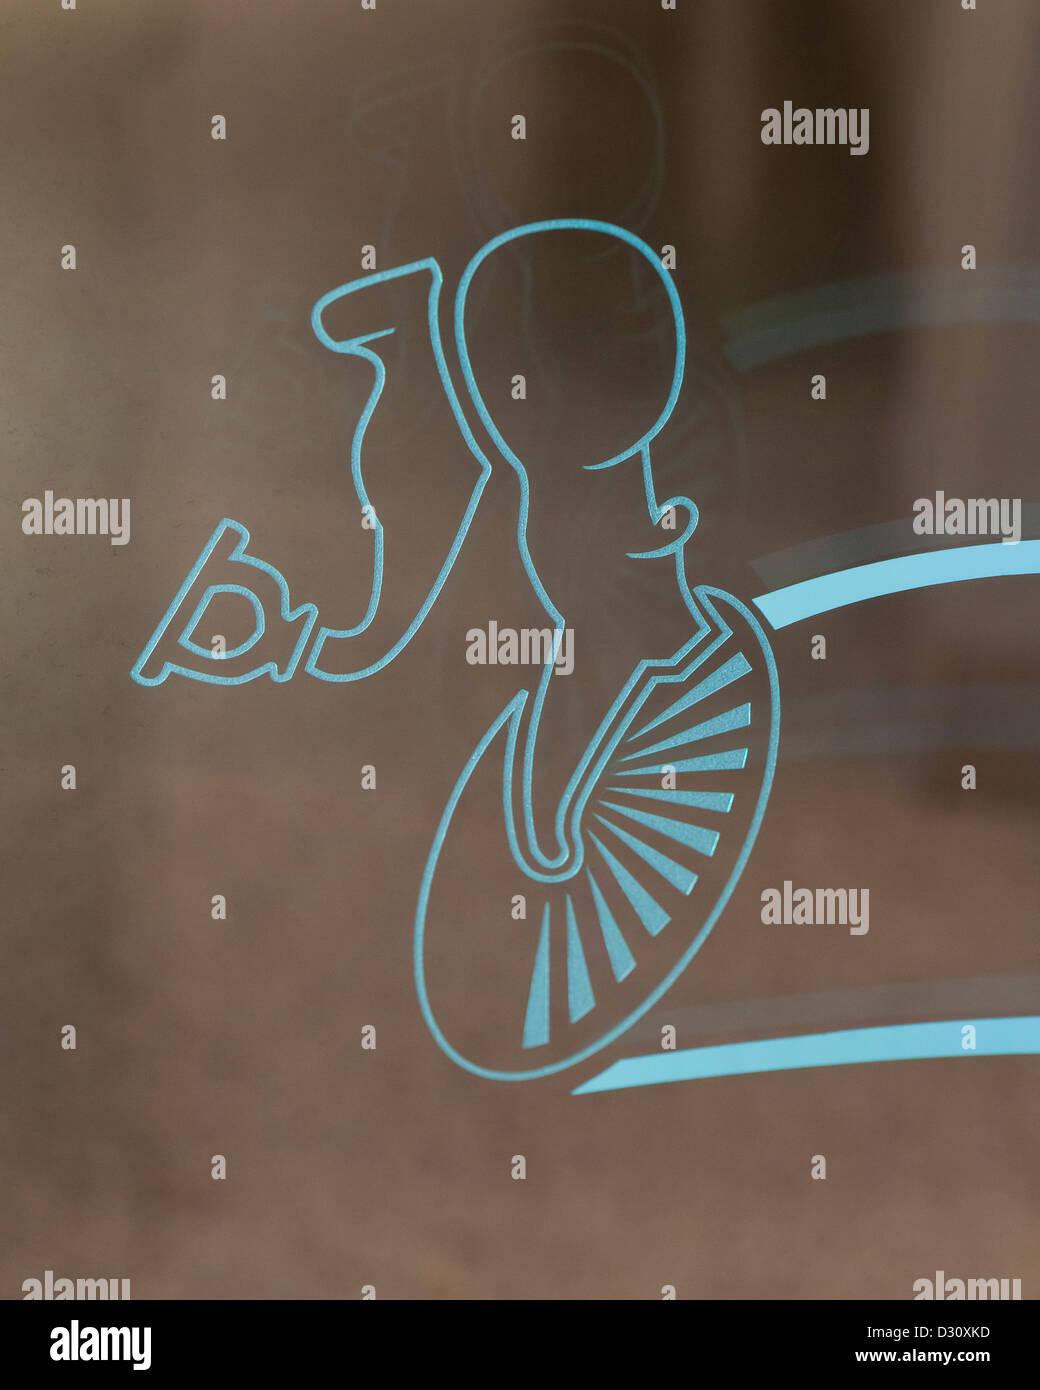 Human Ear Stockfotos & Human Ear Bilder - Alamy